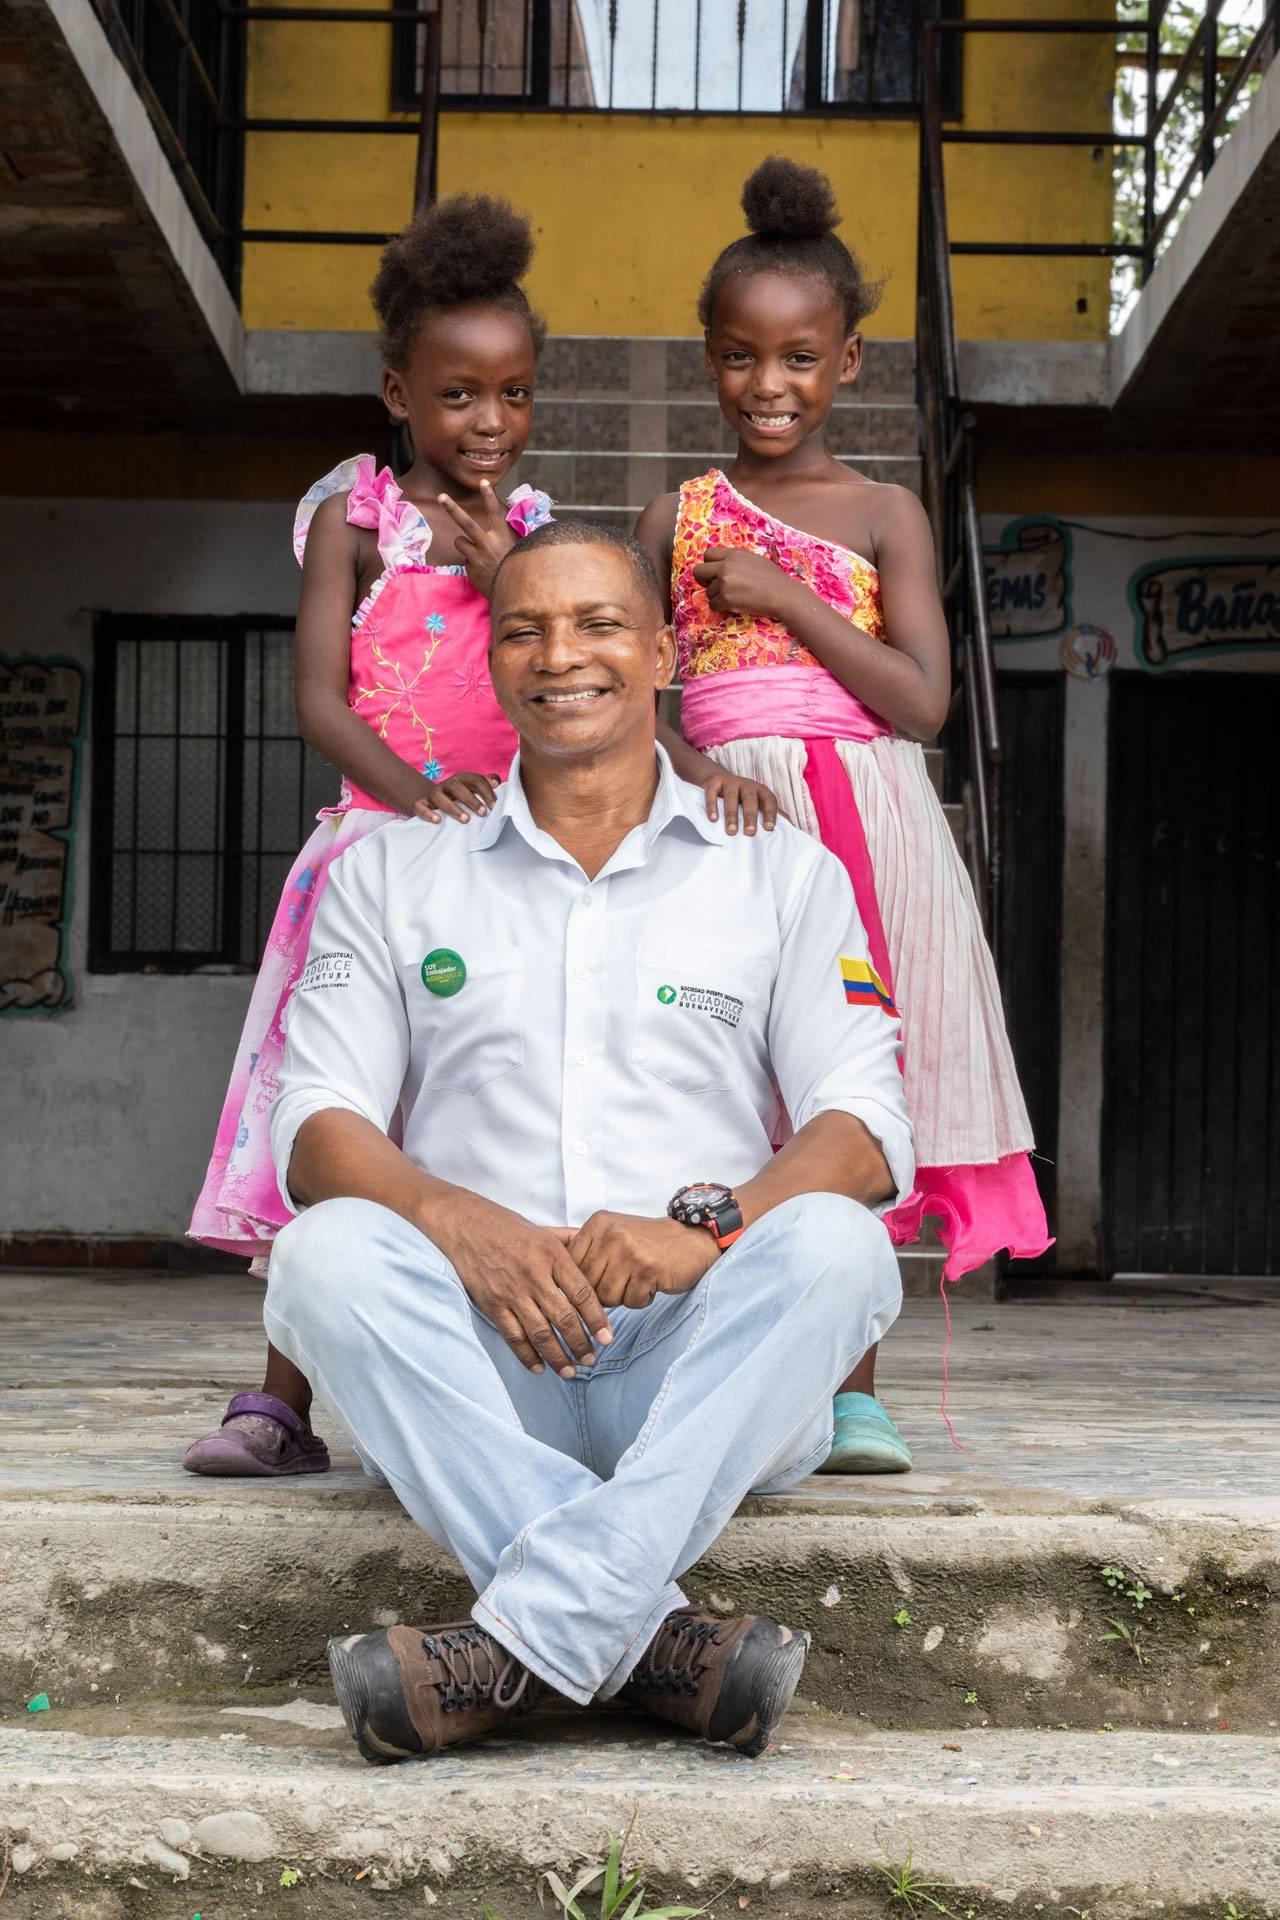 Colaborador de Puerto Aguadulce con niñas de las comunidades aledañas